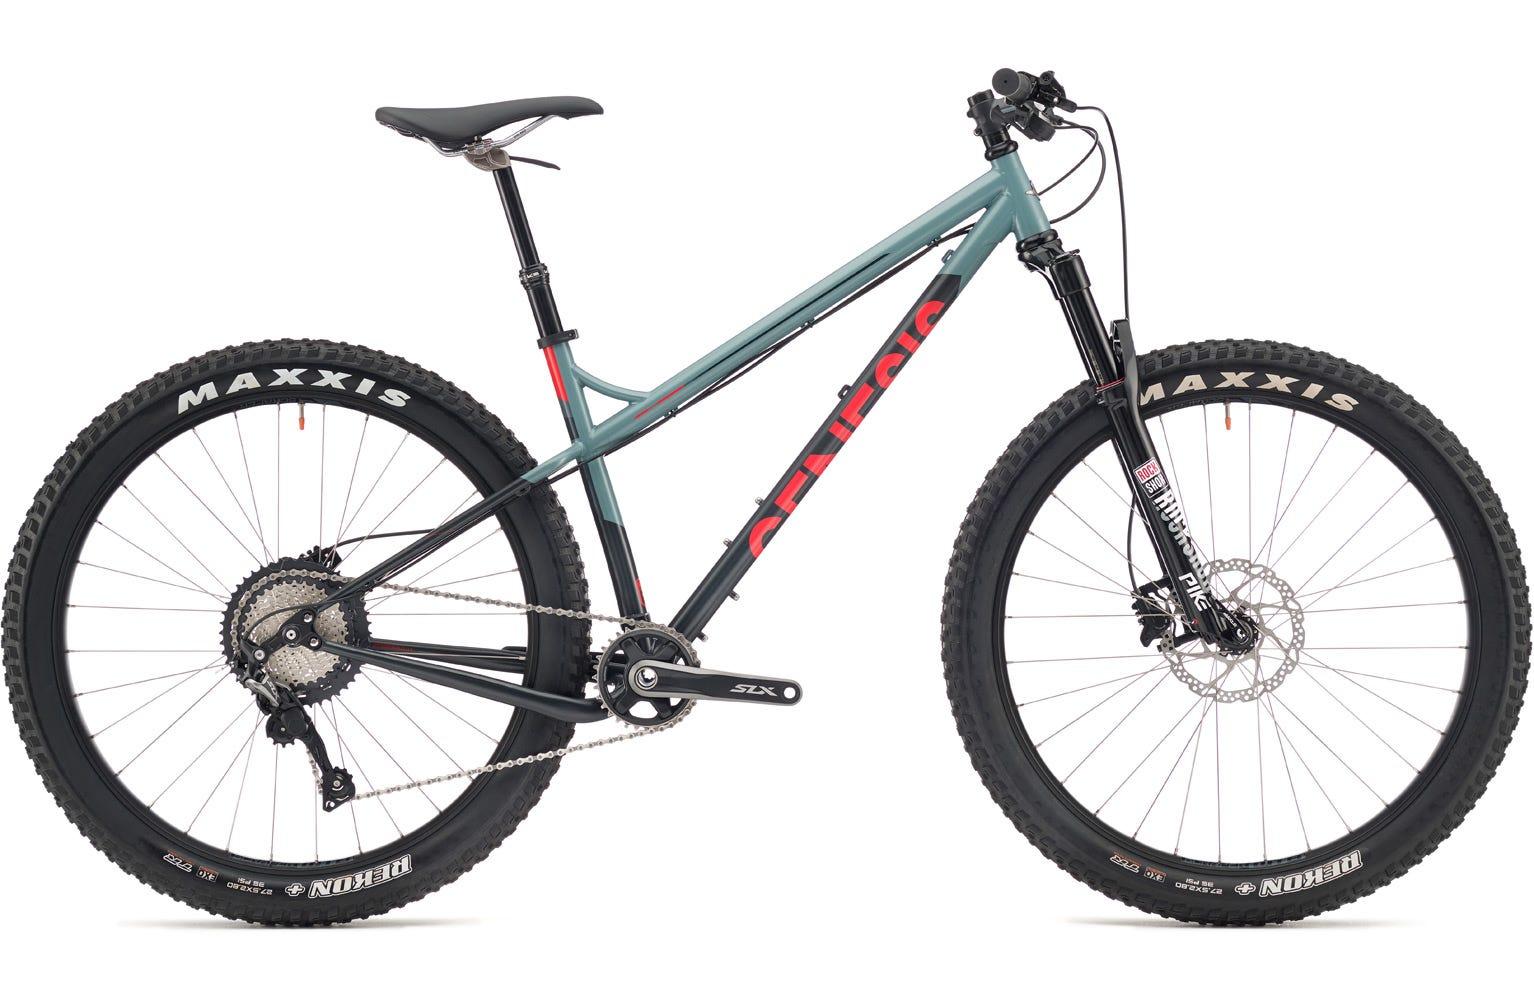 Genesis 2018 Tarn 20 md Ex Display Bike